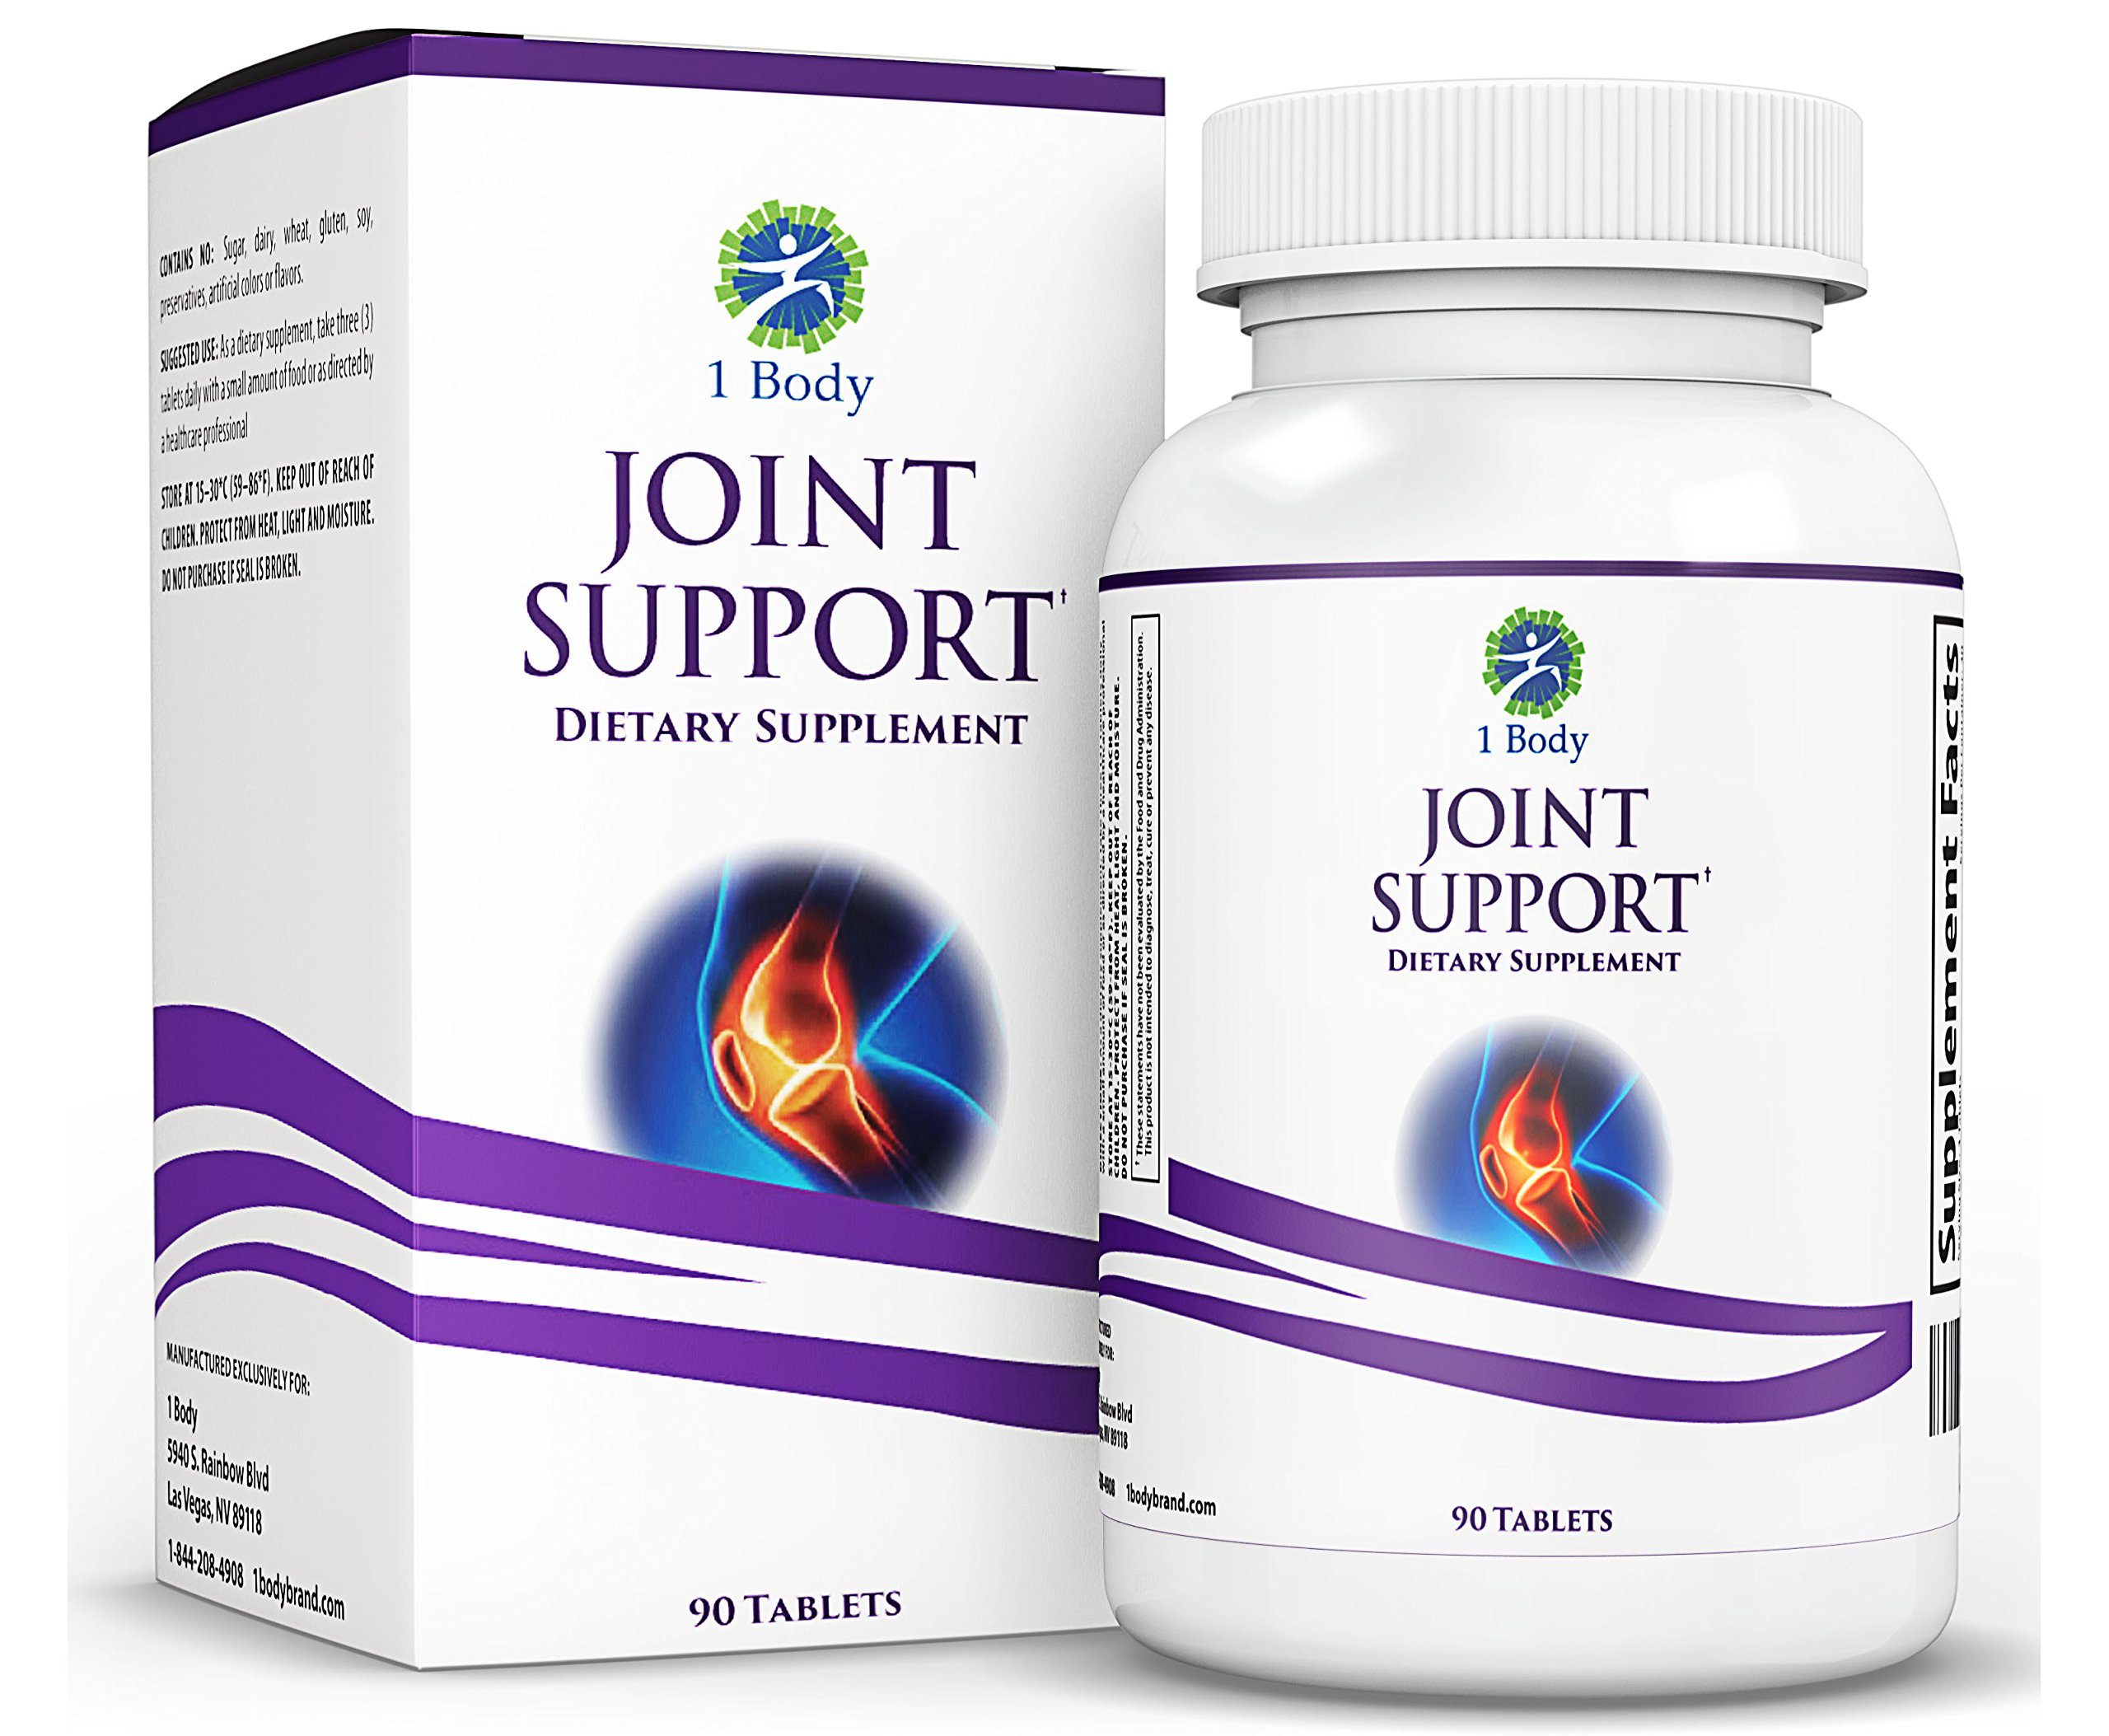 Joint Support Supplement – Turmeric Curcumin ( Curcuma Extract 95% Curcuminoids ), Glucosamine, Chondroitin, MSM, ApresFlex, Ginger Root, Bromelain, Quercetin & More